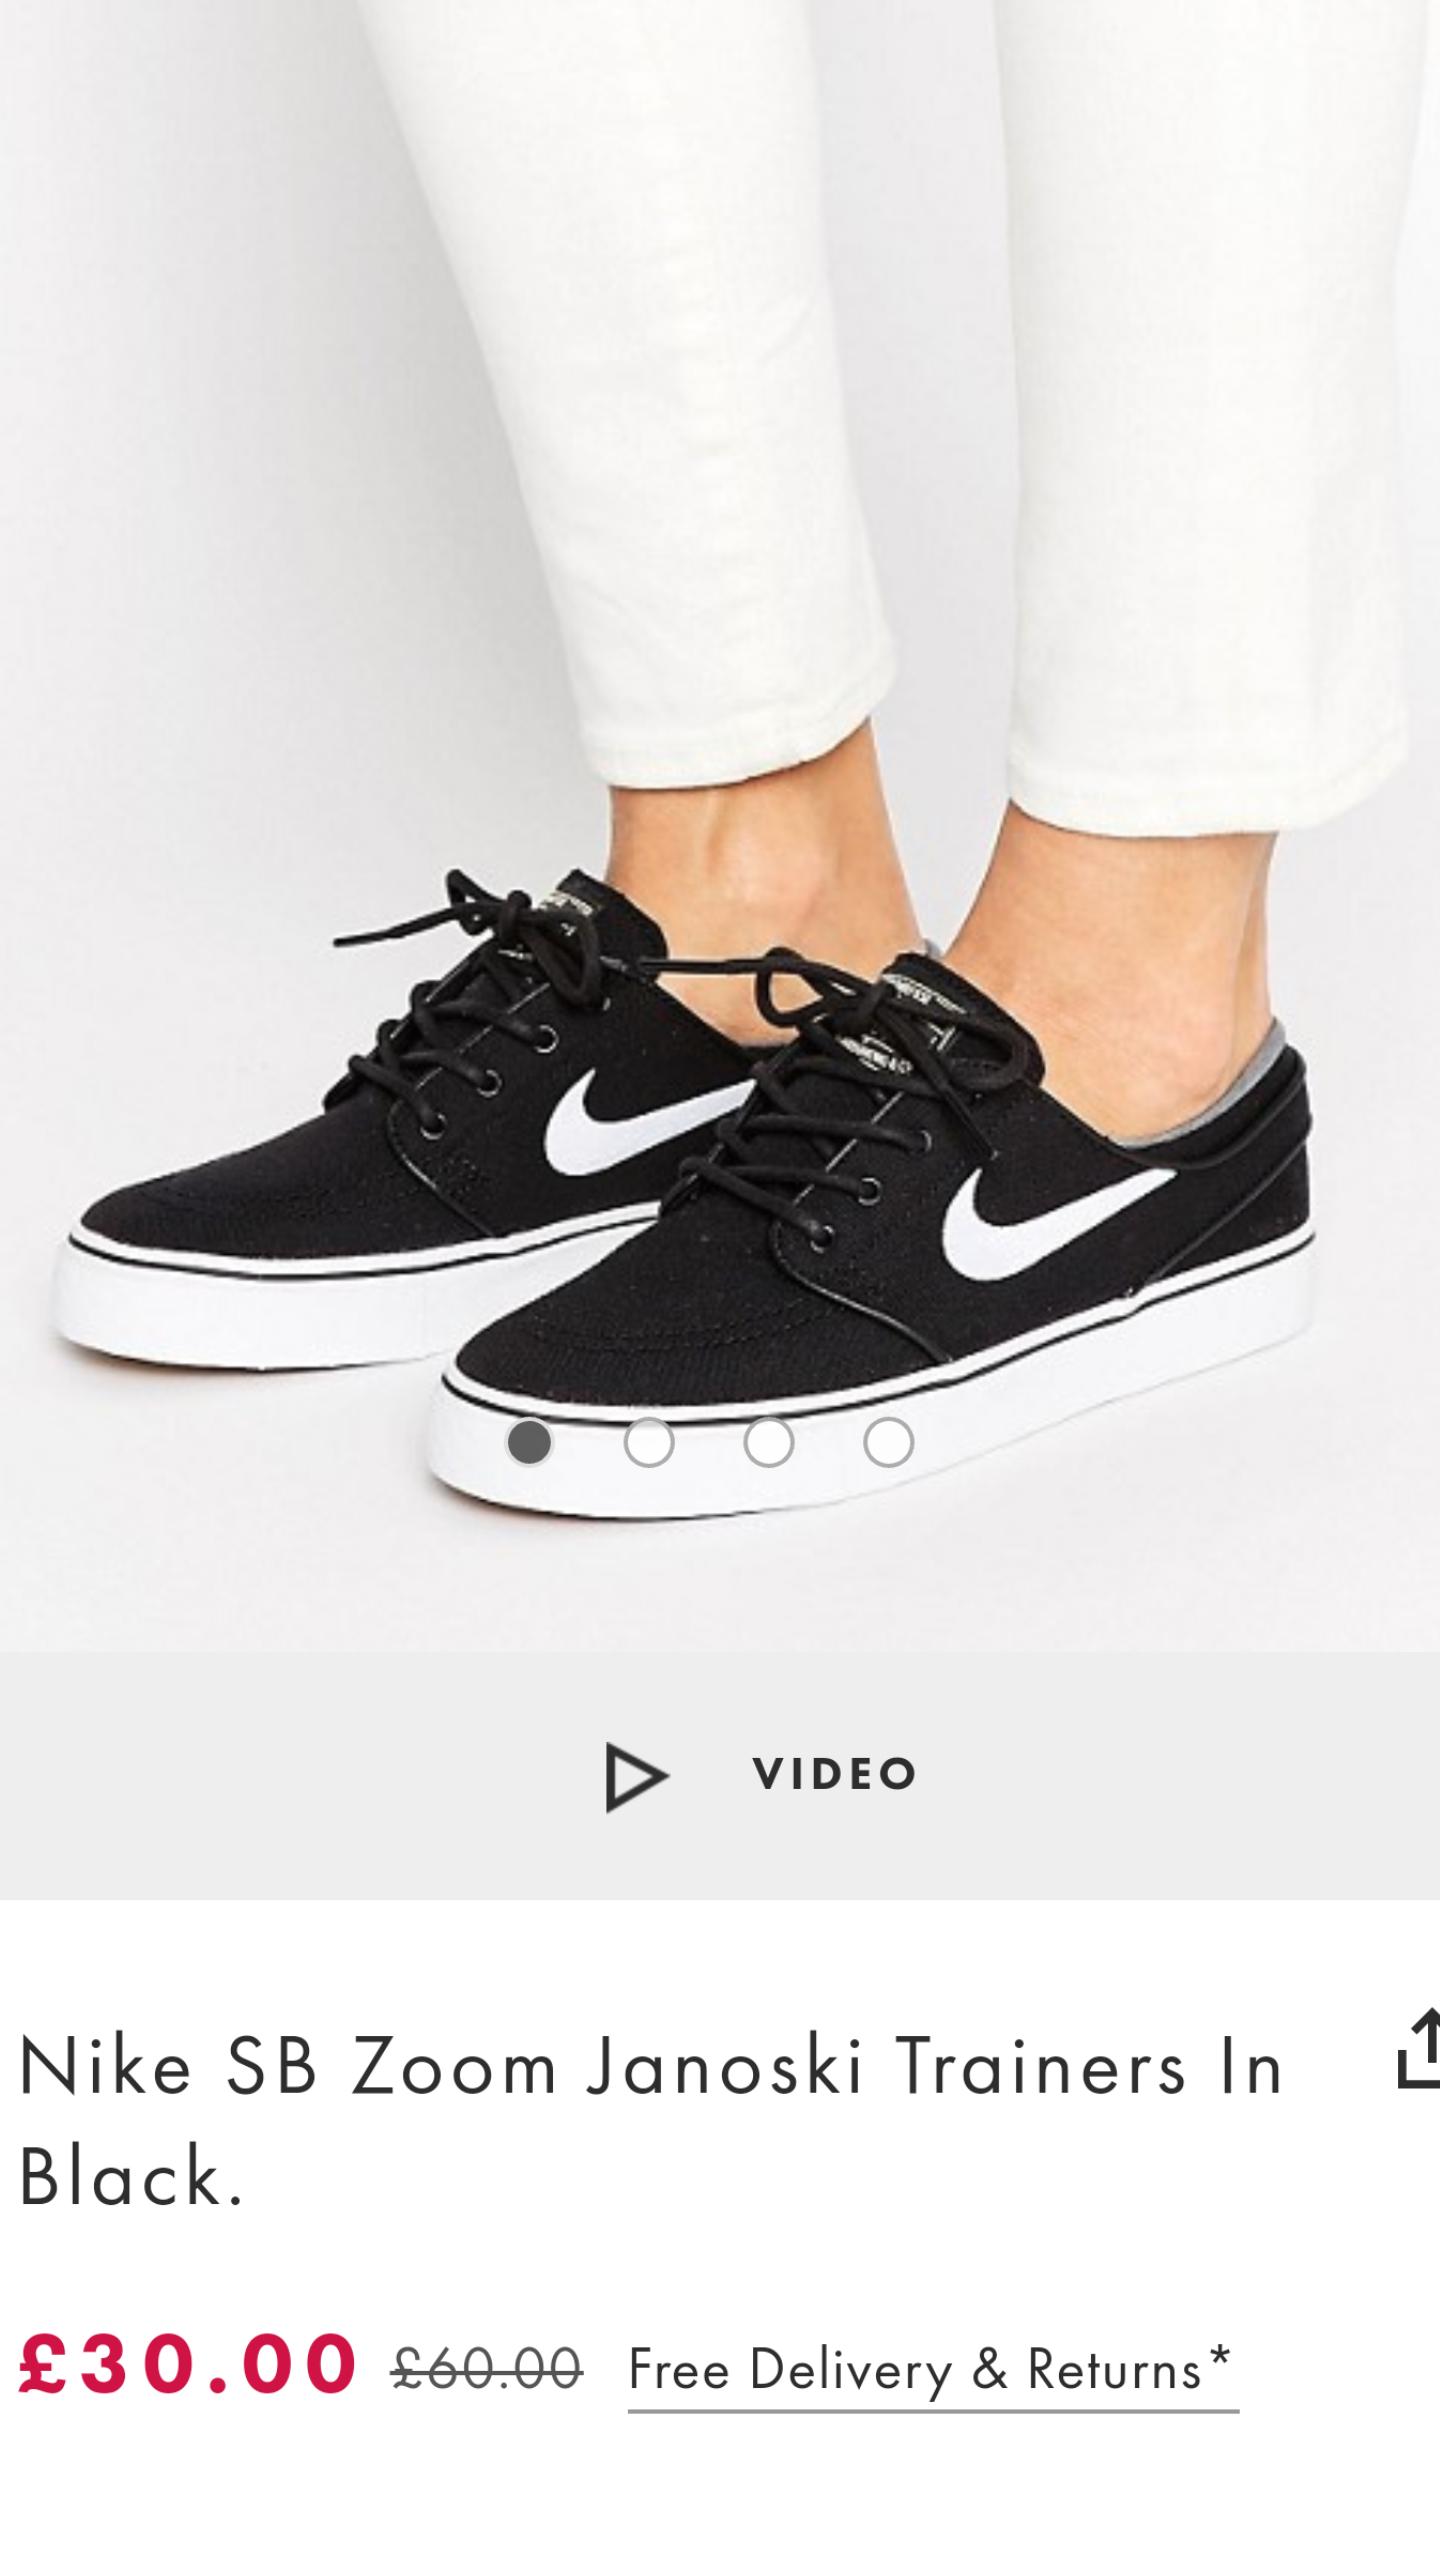 Nike SB Zoom Janoski Trainers In Black - ASOS - £30